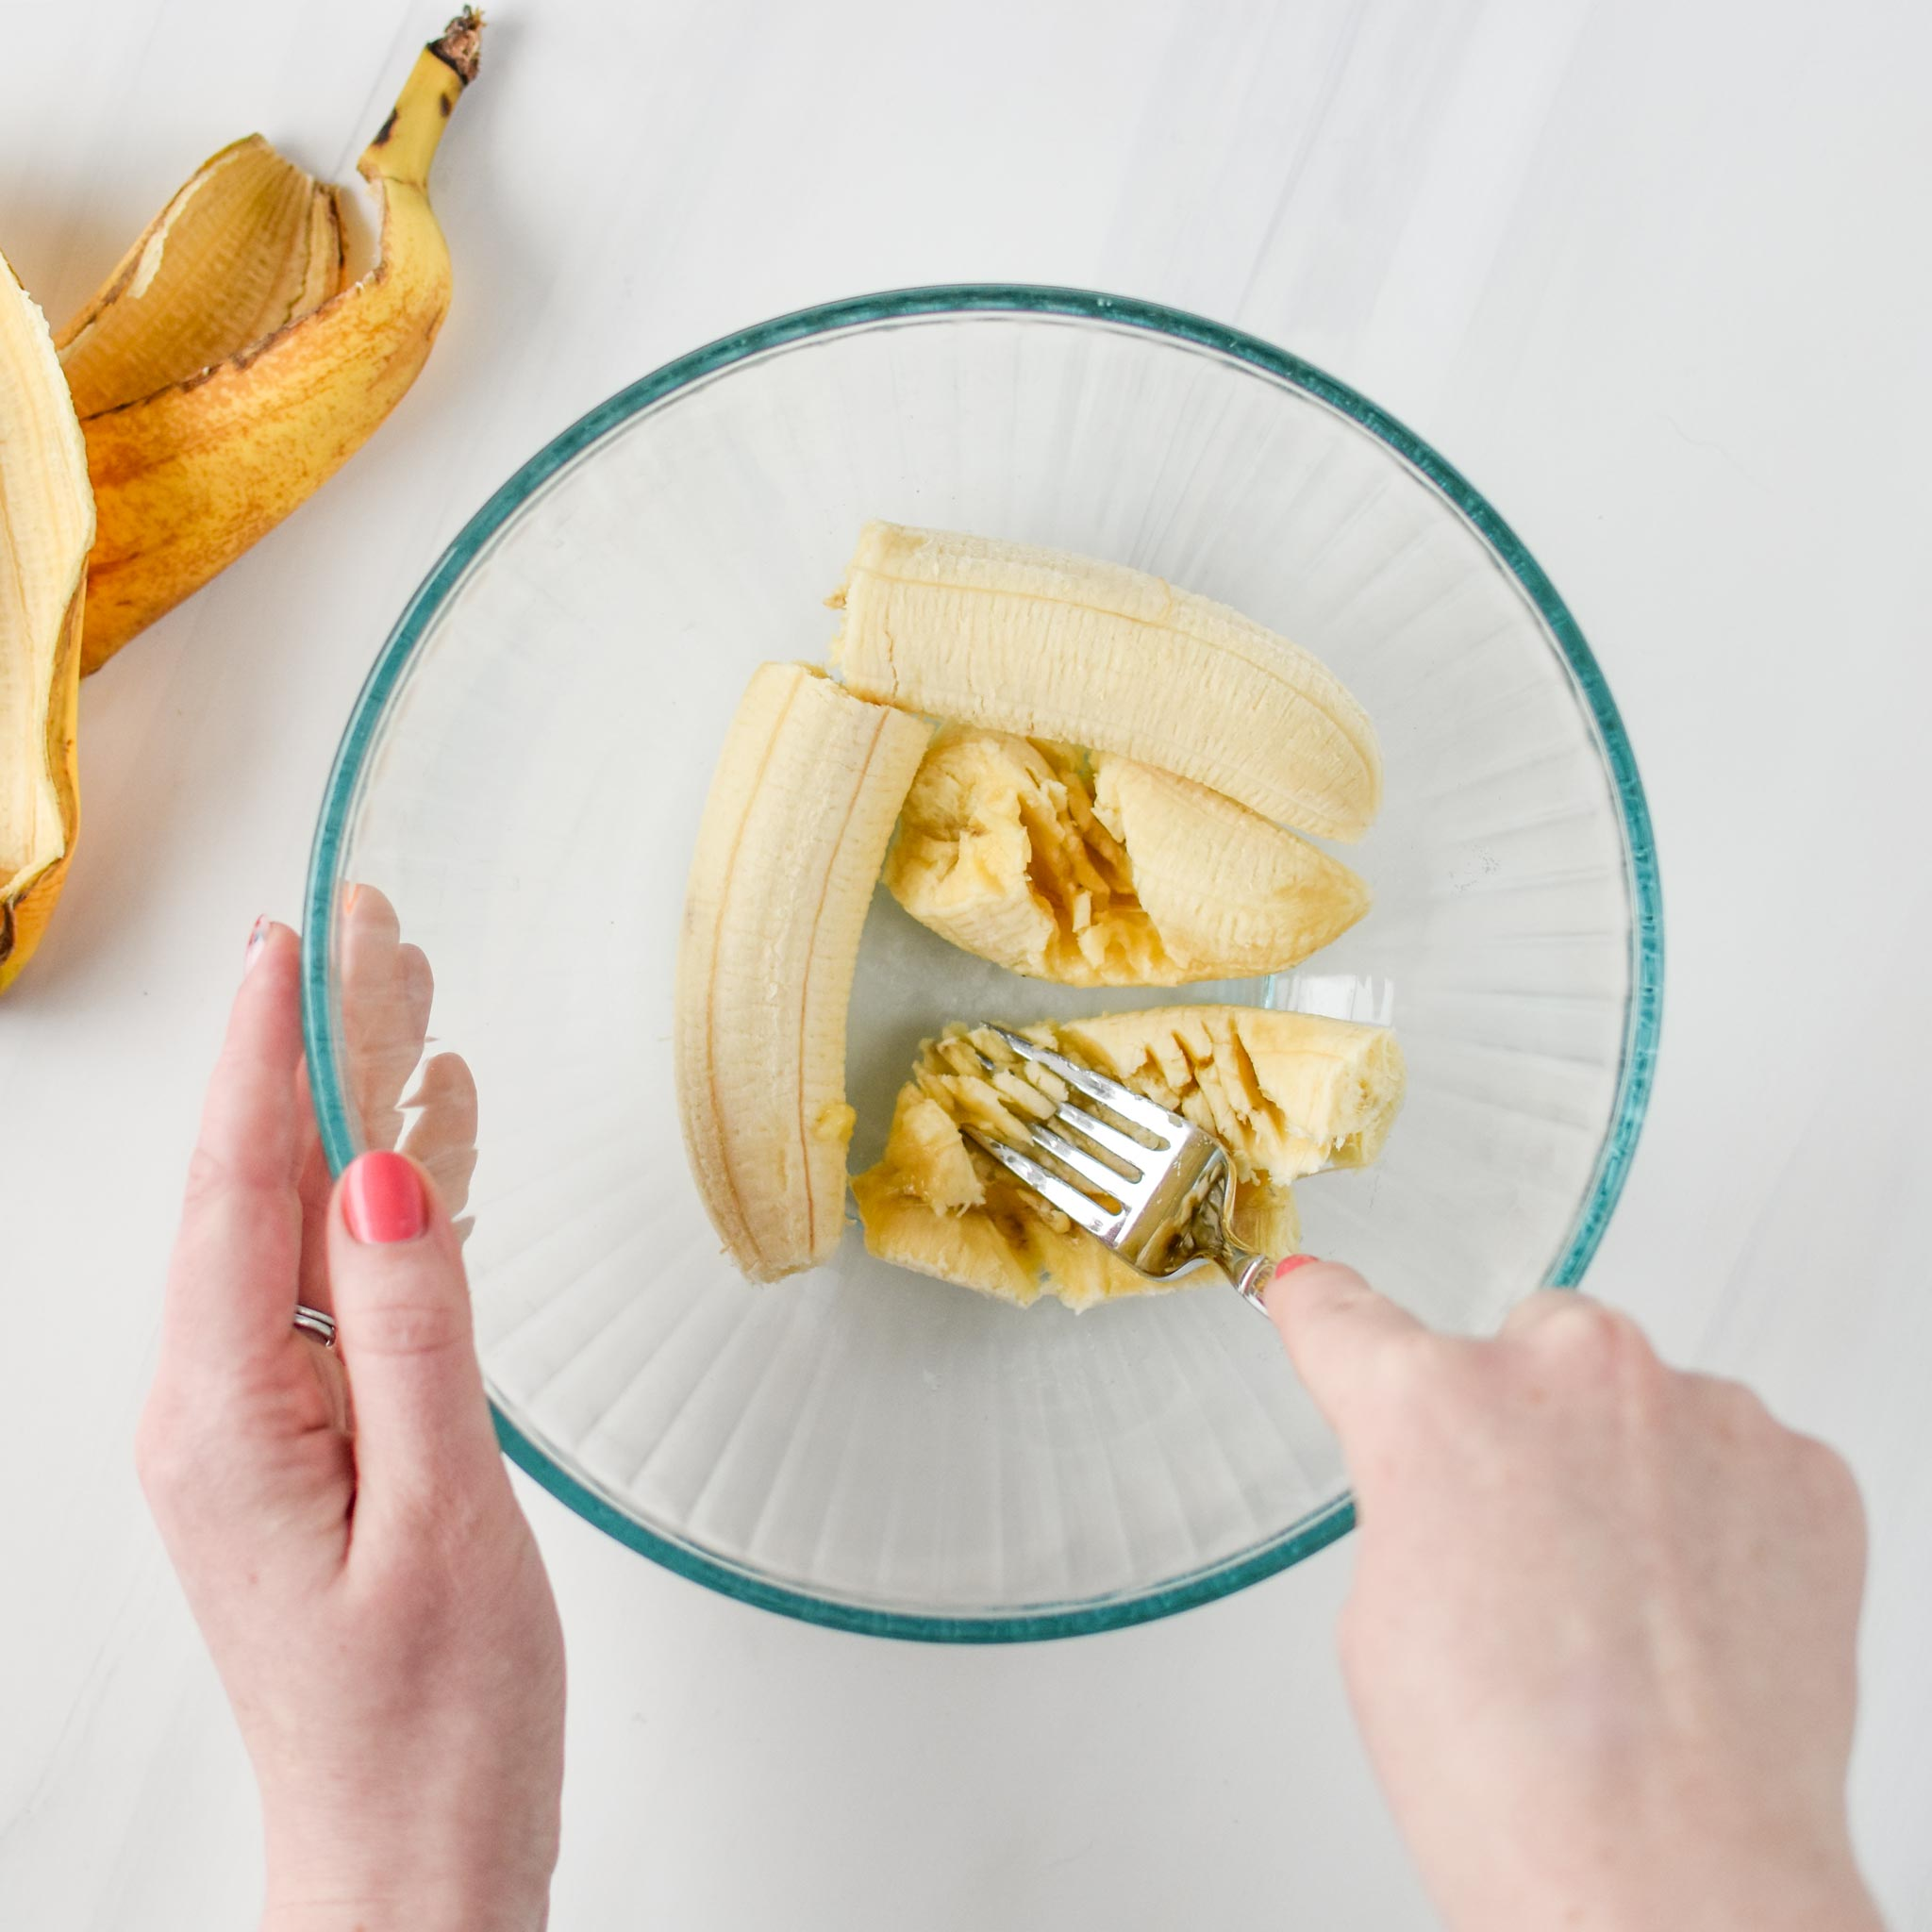 mashing bananas for the peanut butter banana oatmeal breakfast bars